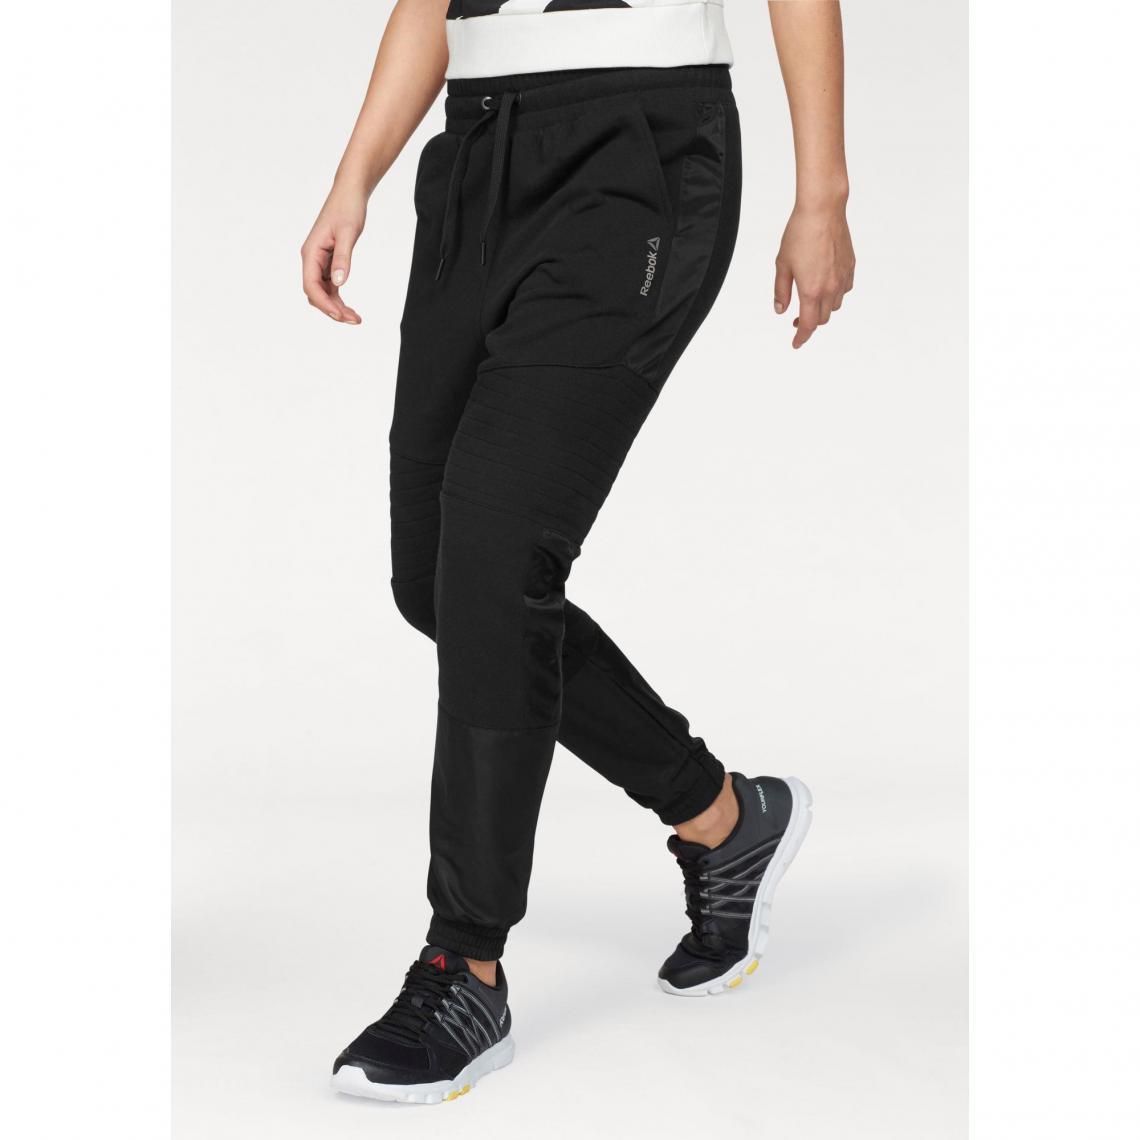 Pantalon sport femme Moto Jogger Reebok Noir 1 Avis